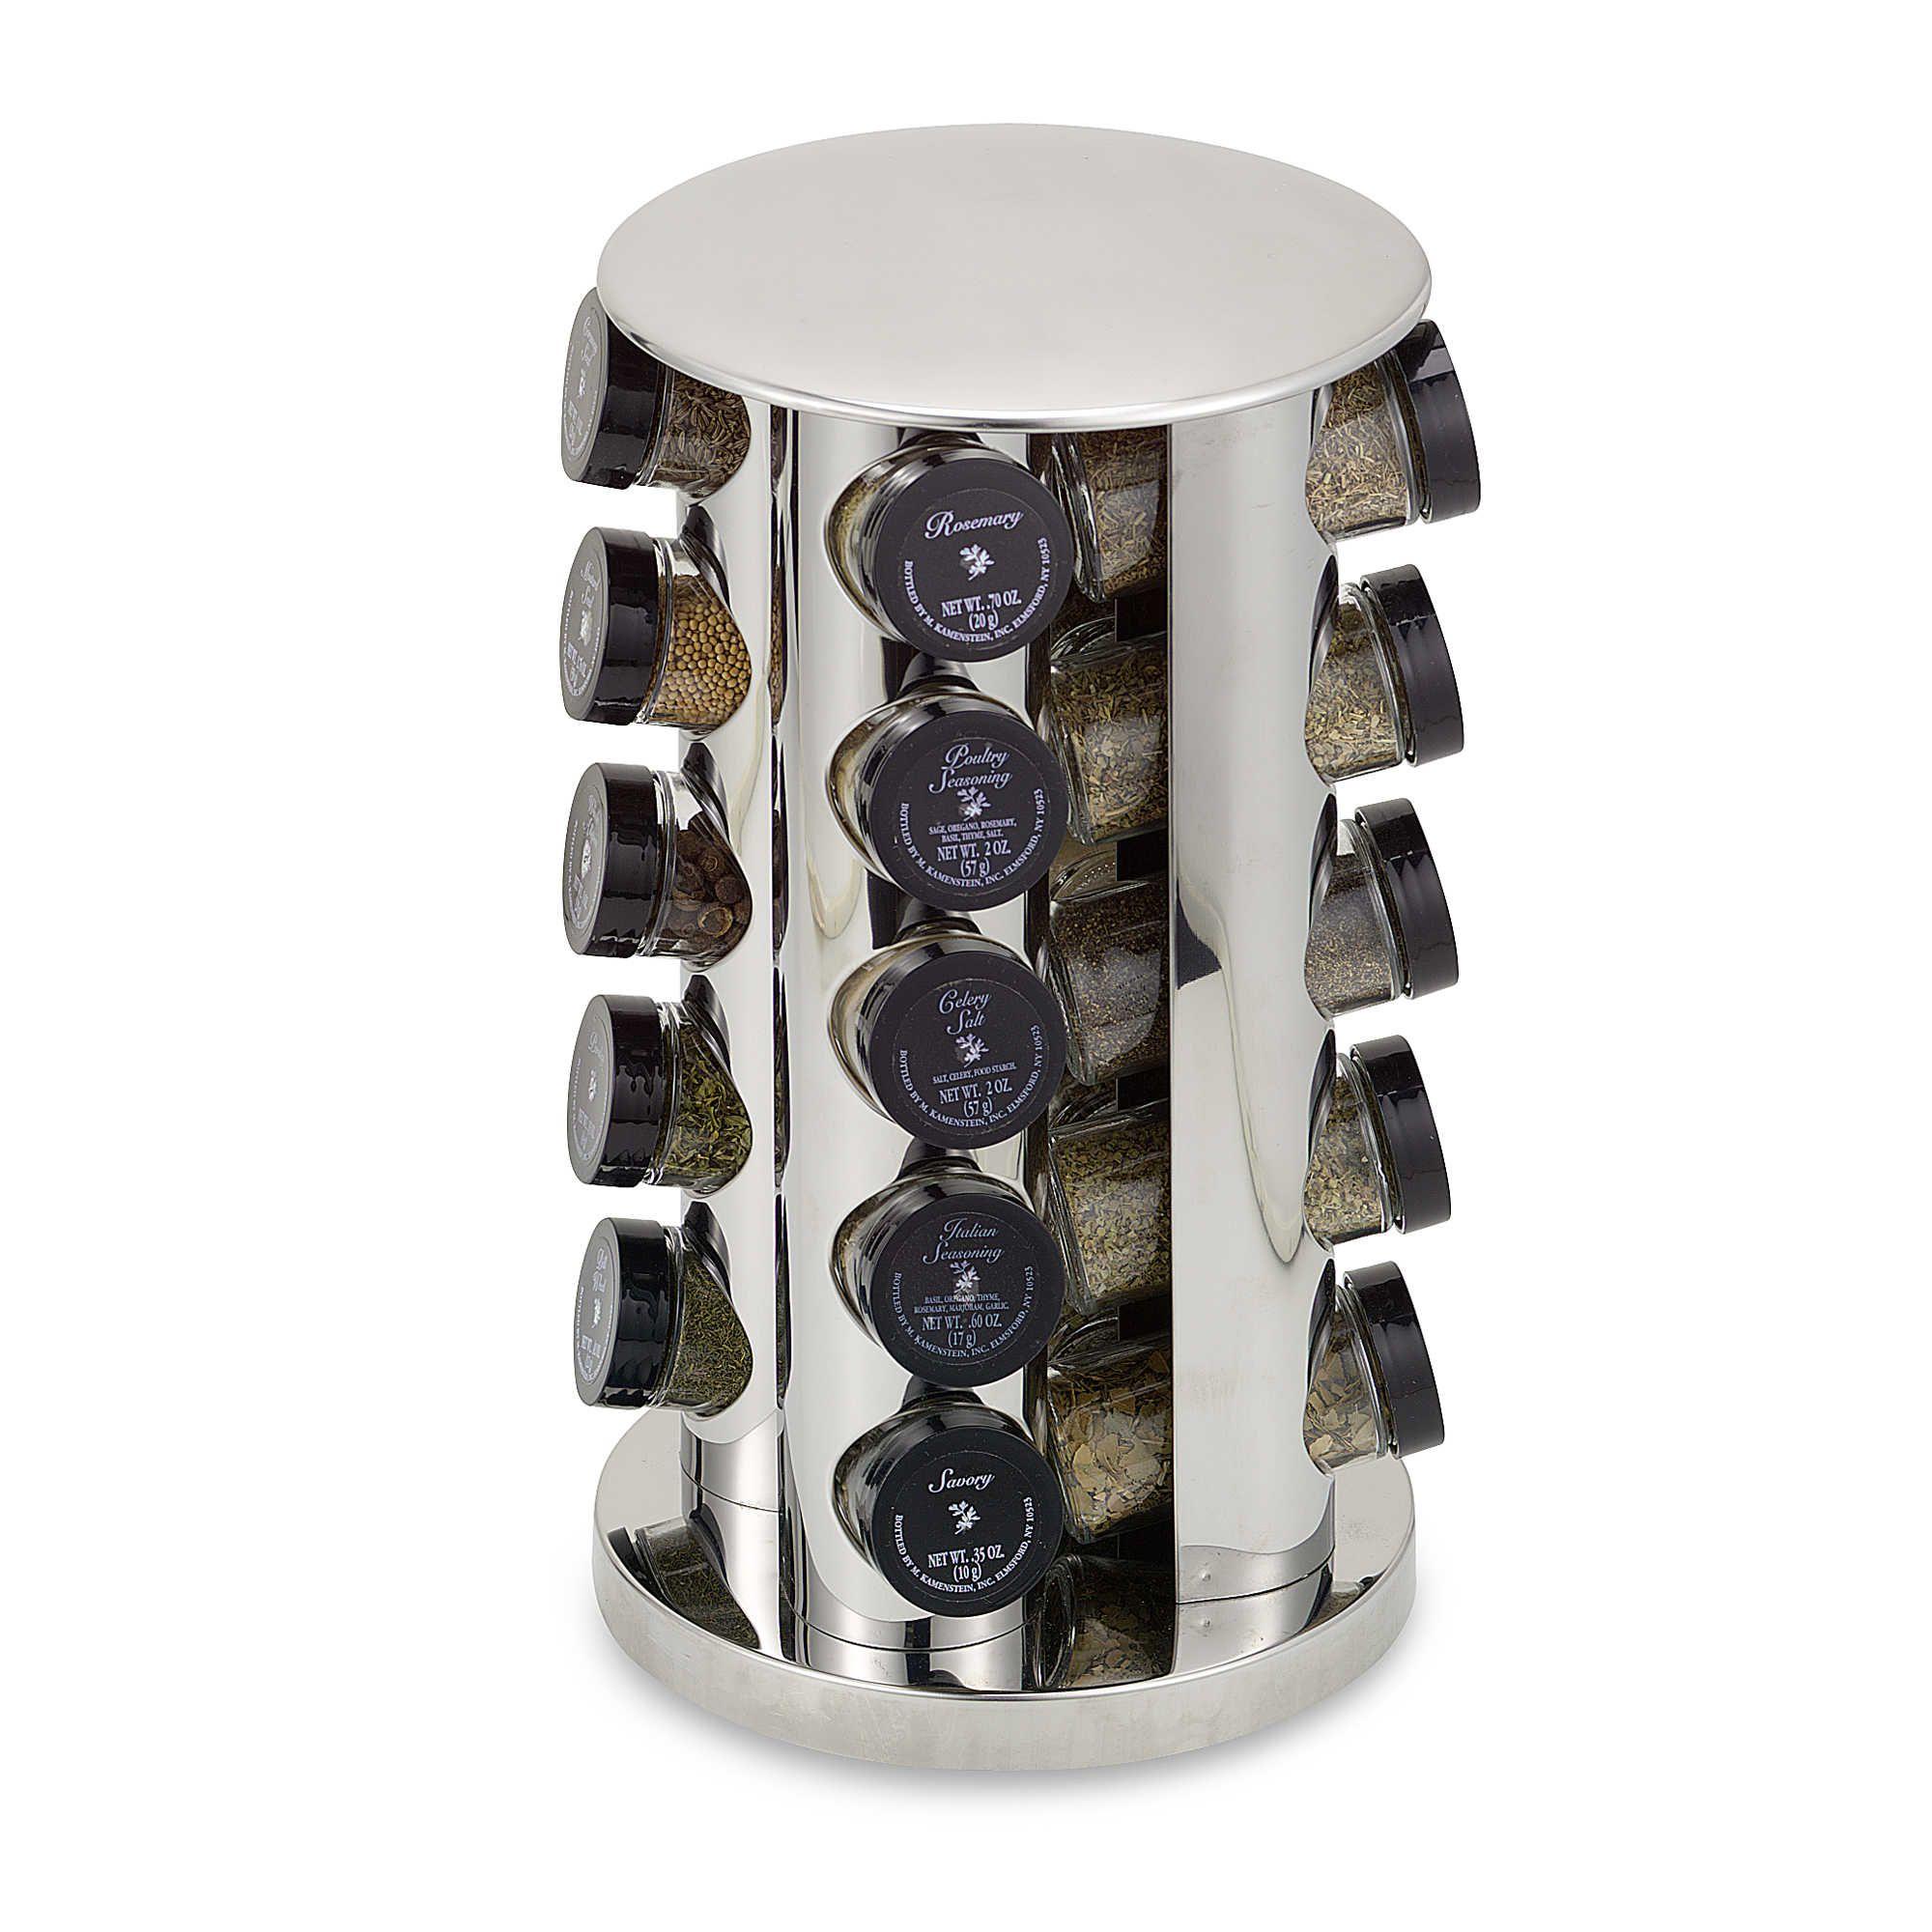 Kamenstein stainless steel 20 jar filled revolving spice rack tower